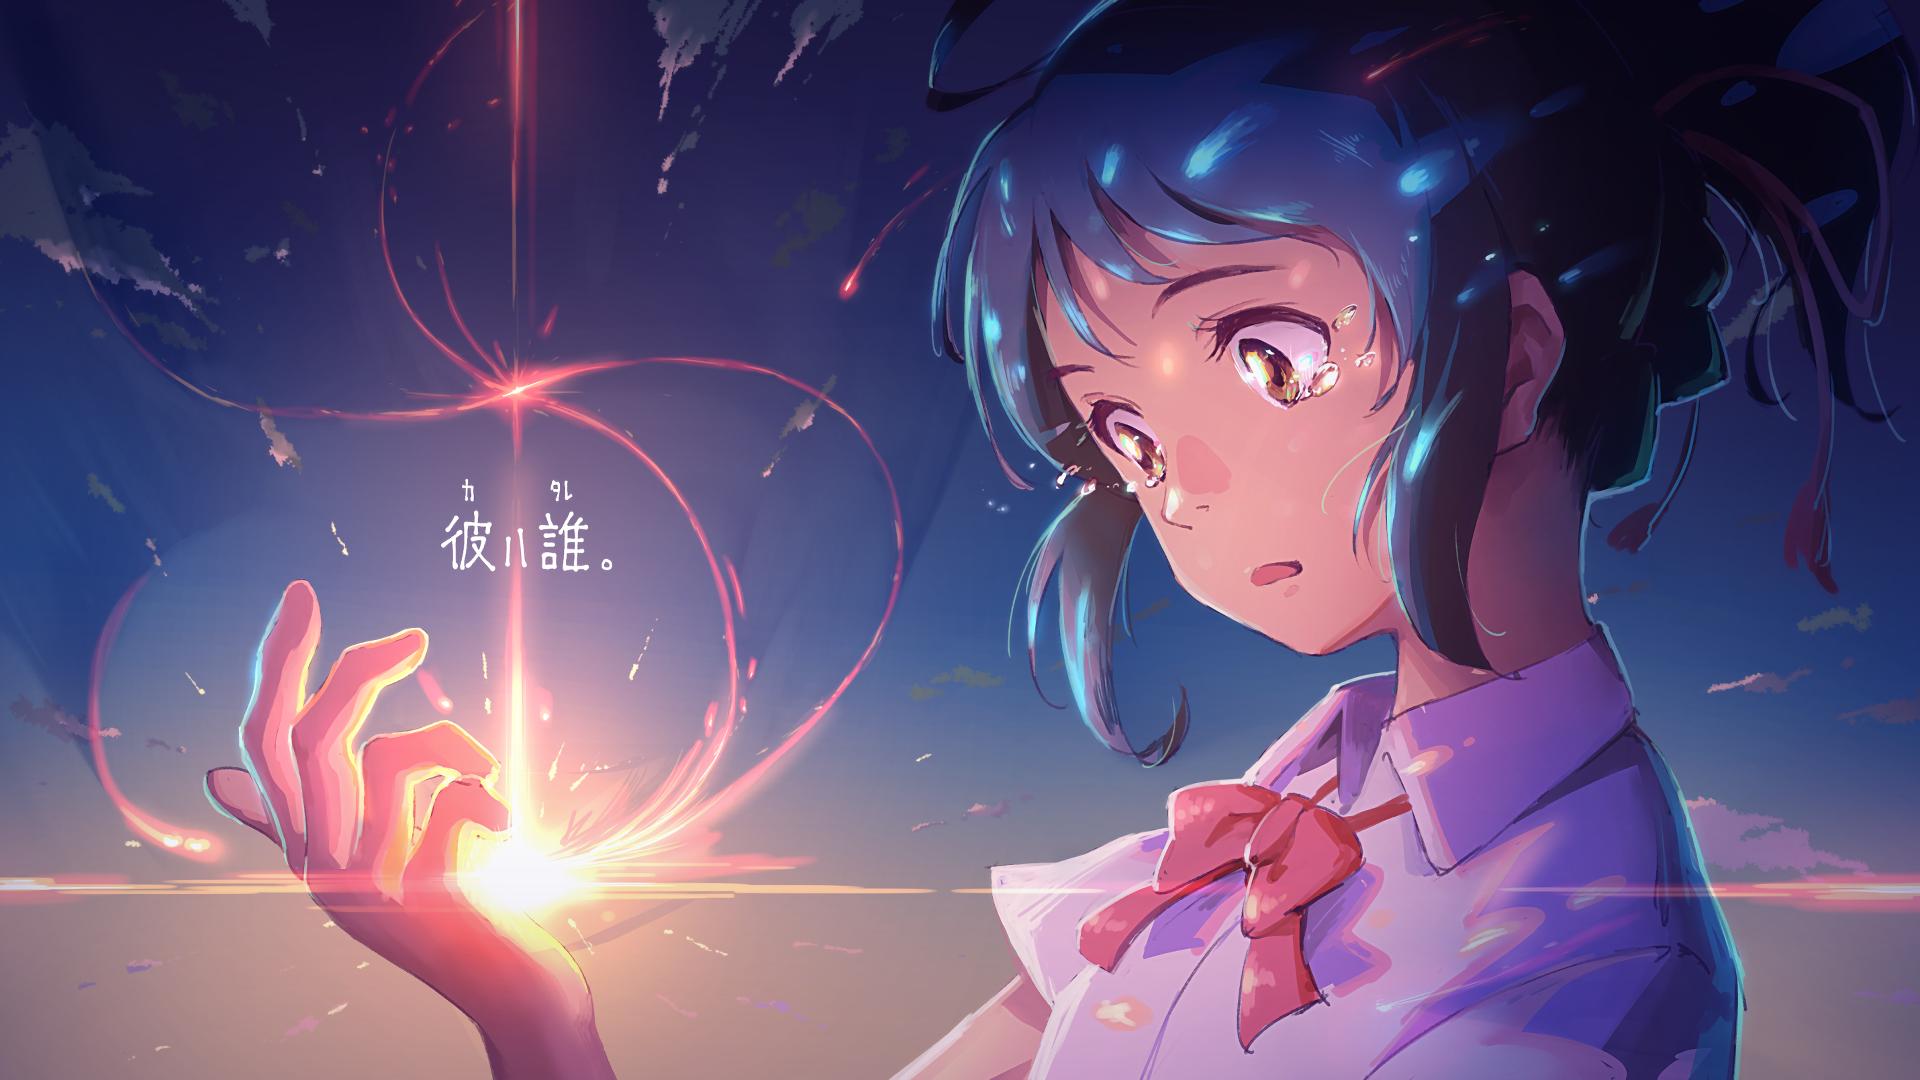 Anime Your Name Mitsuha Miyamizu Kimi No Na Wa Fondo De Pantalla Fondo De Pantalla De Anime Peliculas De Anime Carteles Del Arte